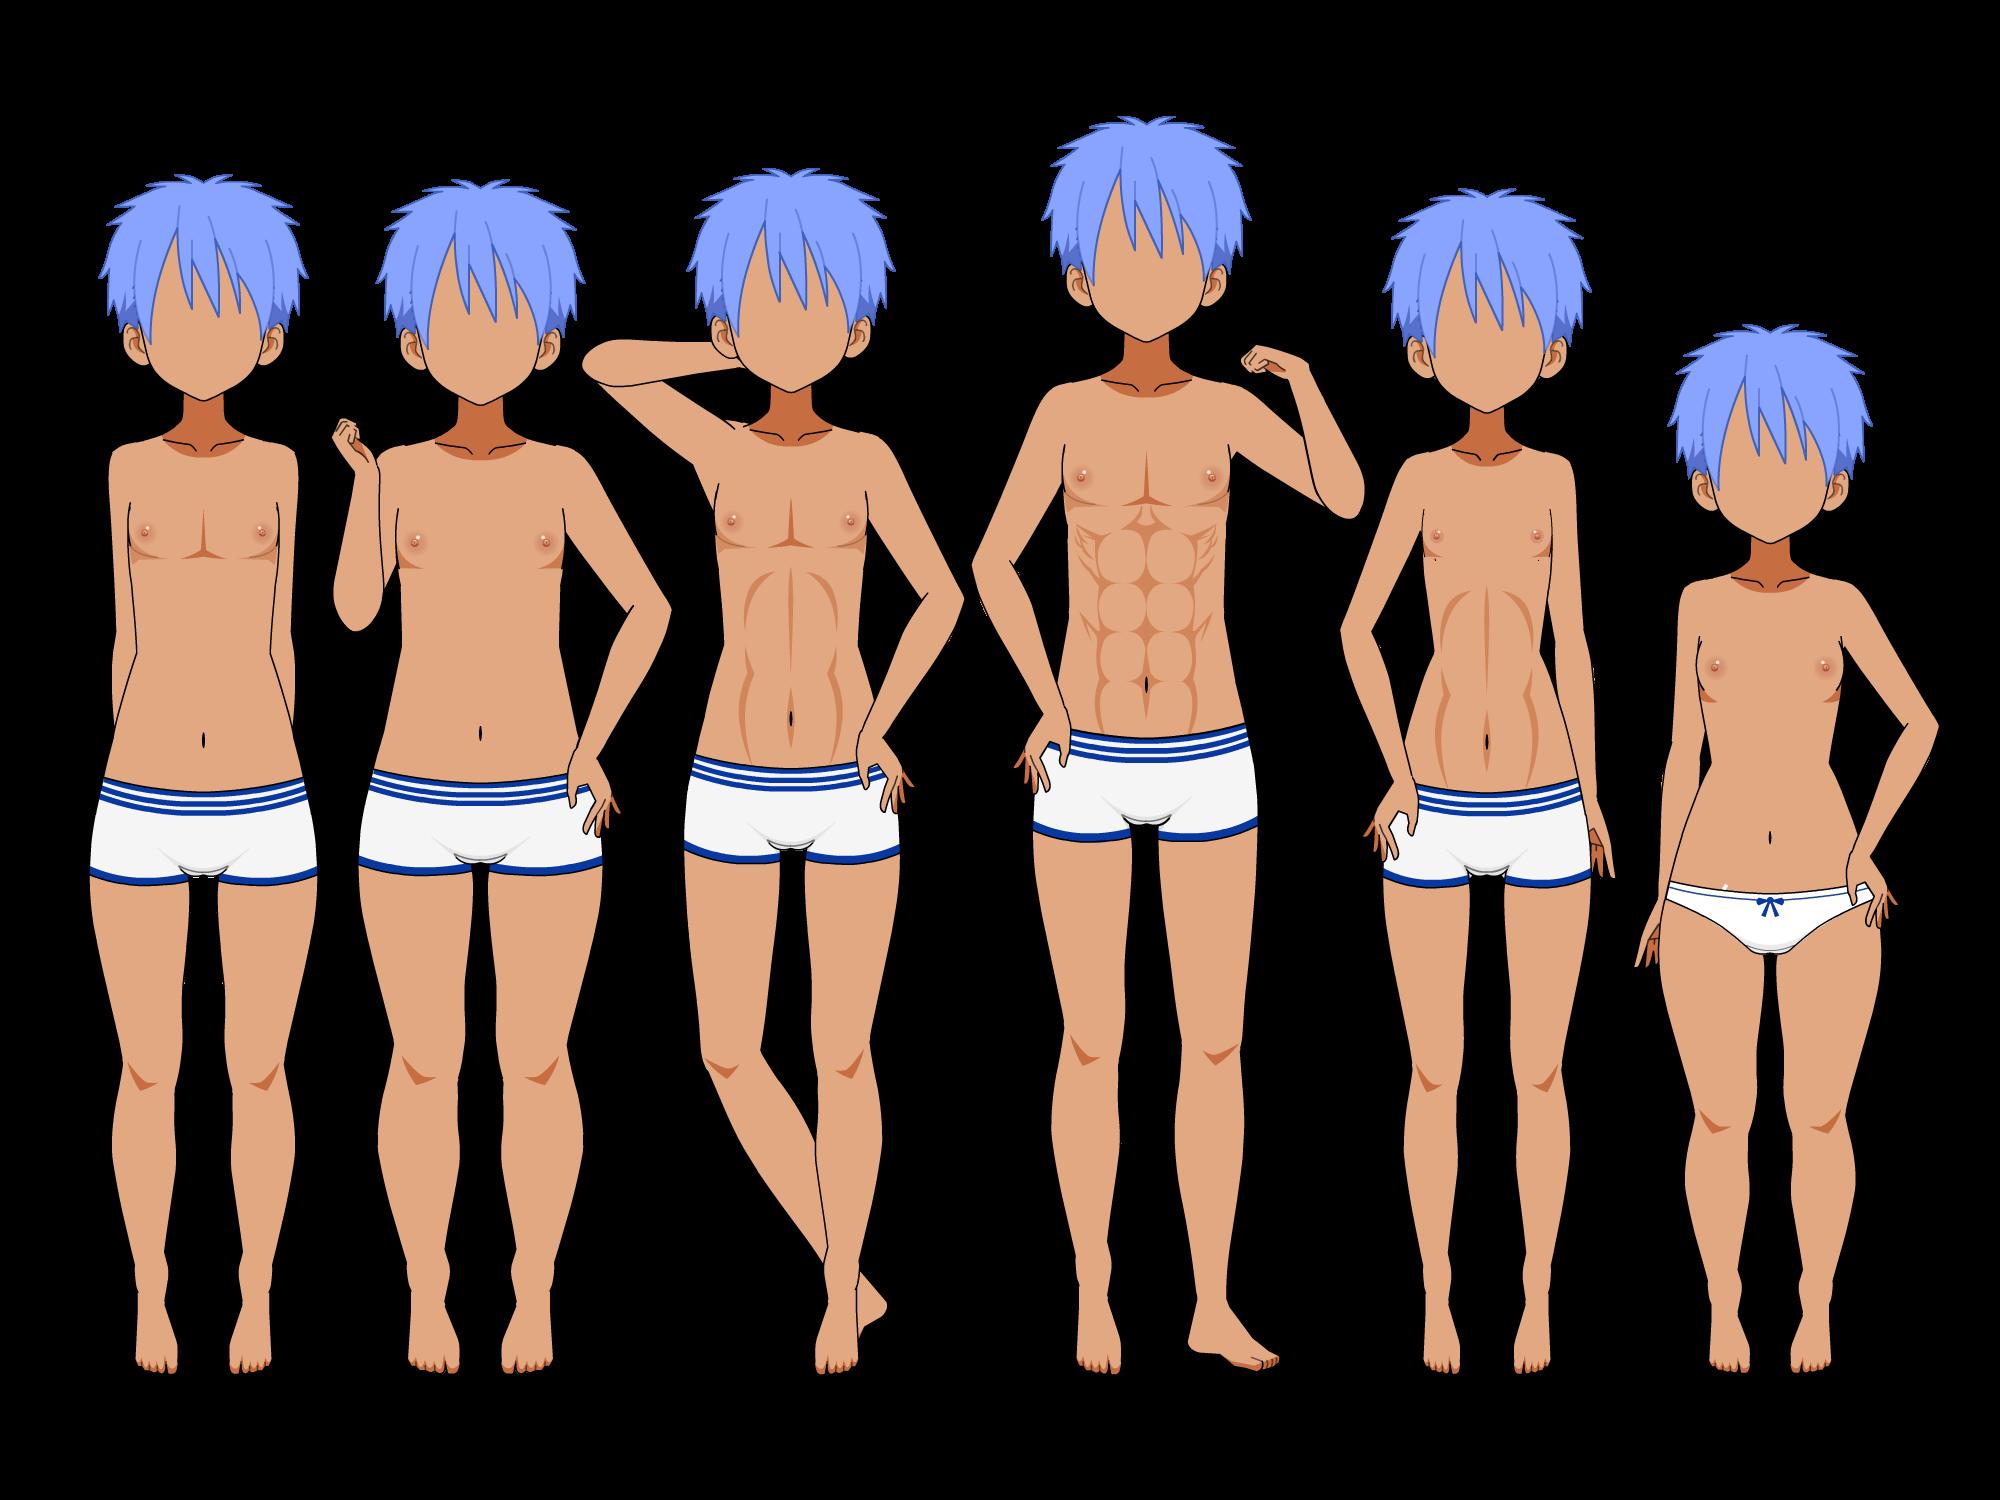 Male Body Types by XxKomori-EmpressxX on DeviantArt